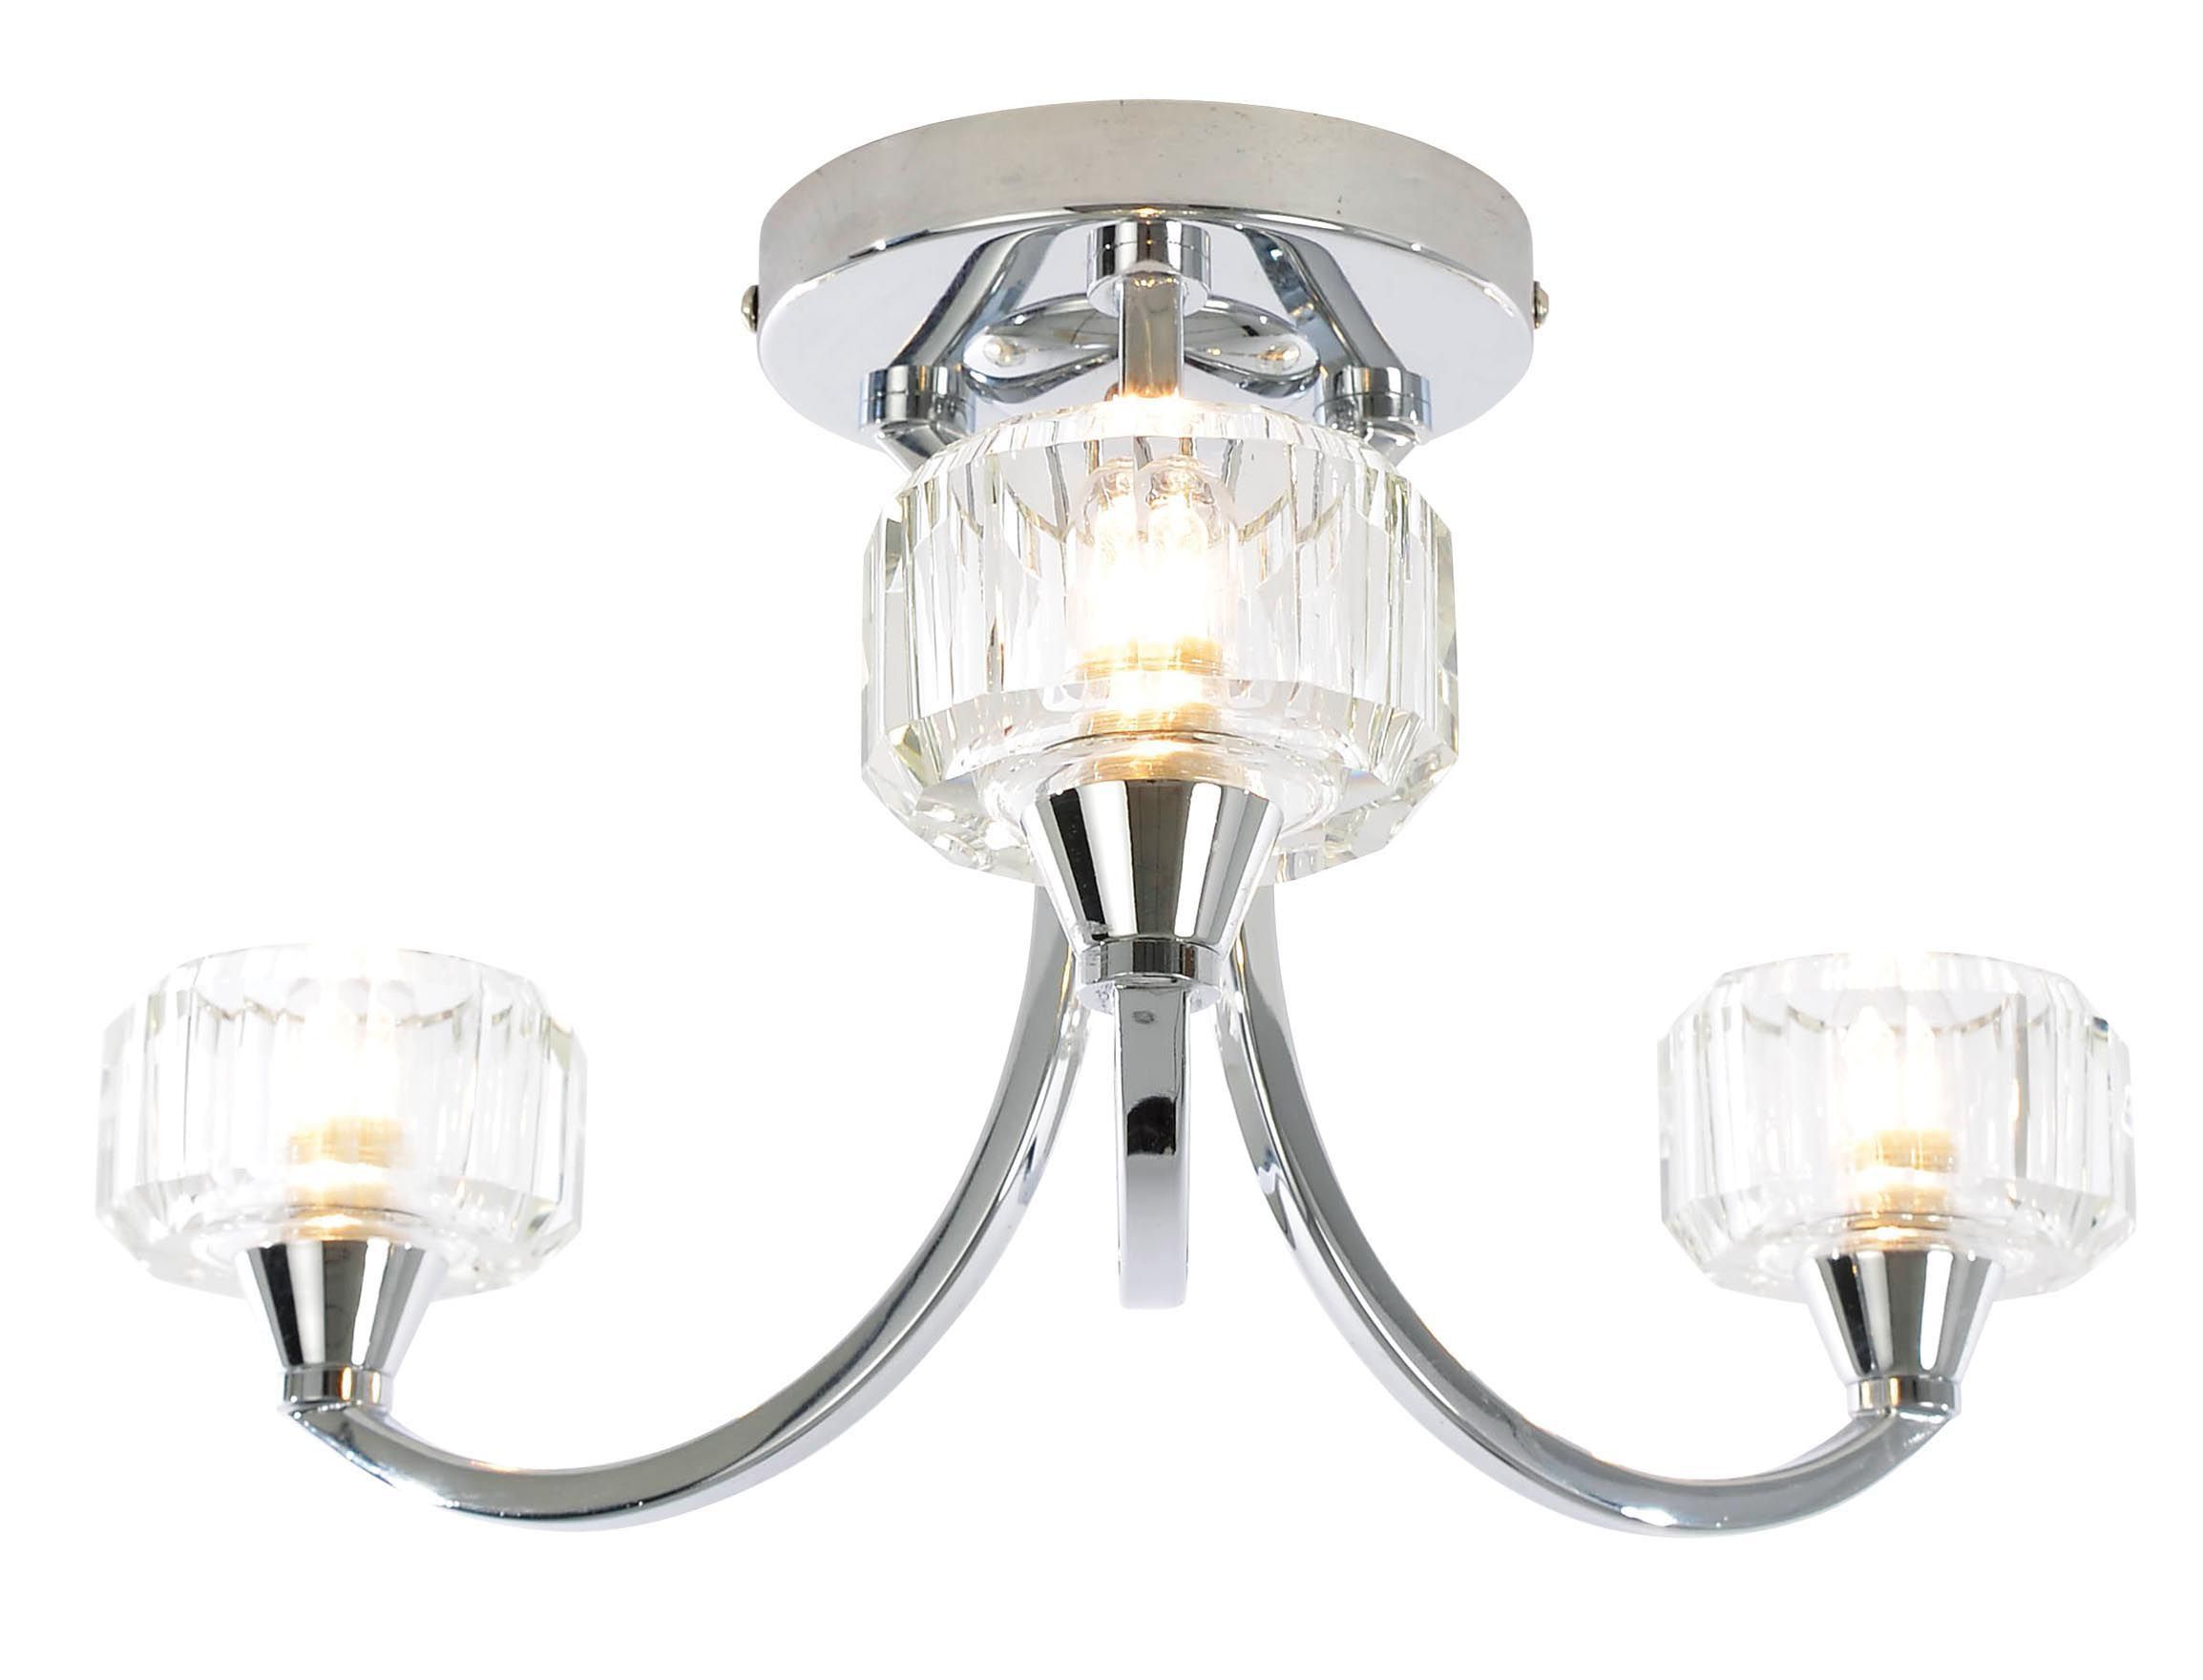 Bathroom ceiling light fixtures chrome lighting ideas for Bathroom pendant lighting fixtures